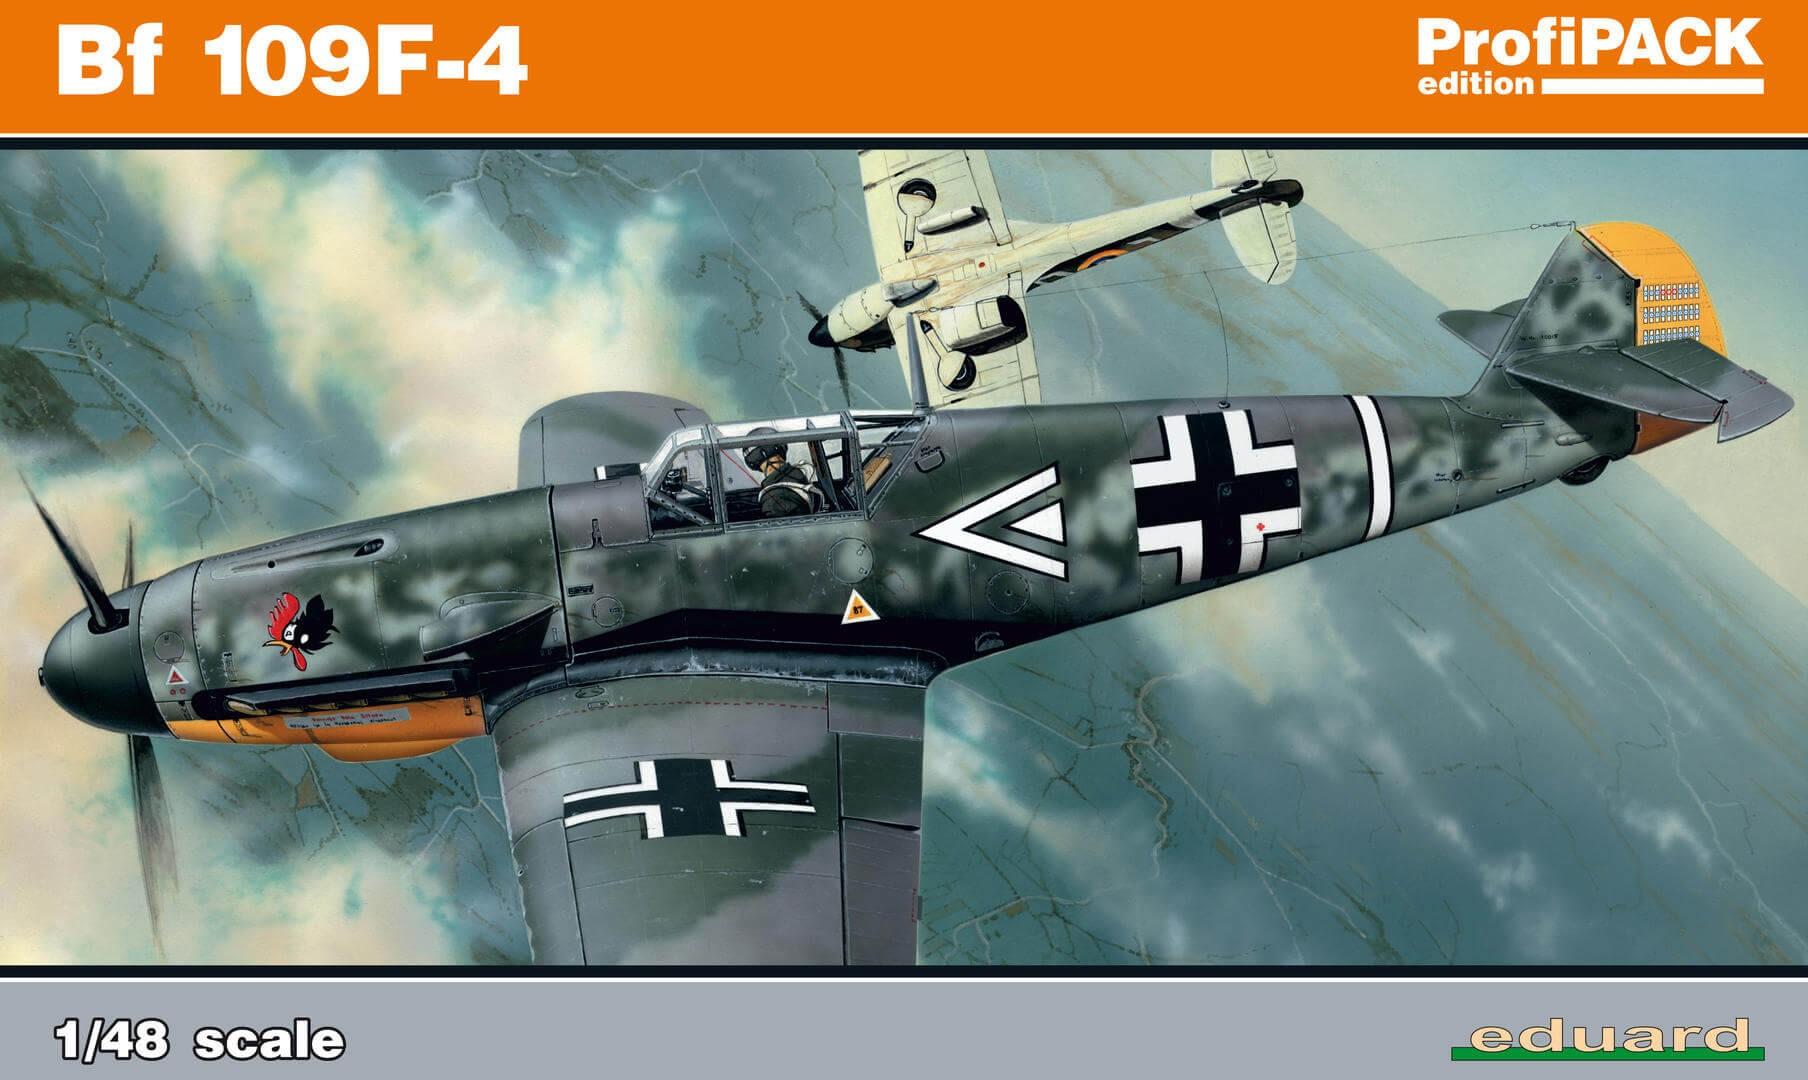 1:48 Messerschmitt Bf 109F-4 ProfiPACK Plastic Model Kit